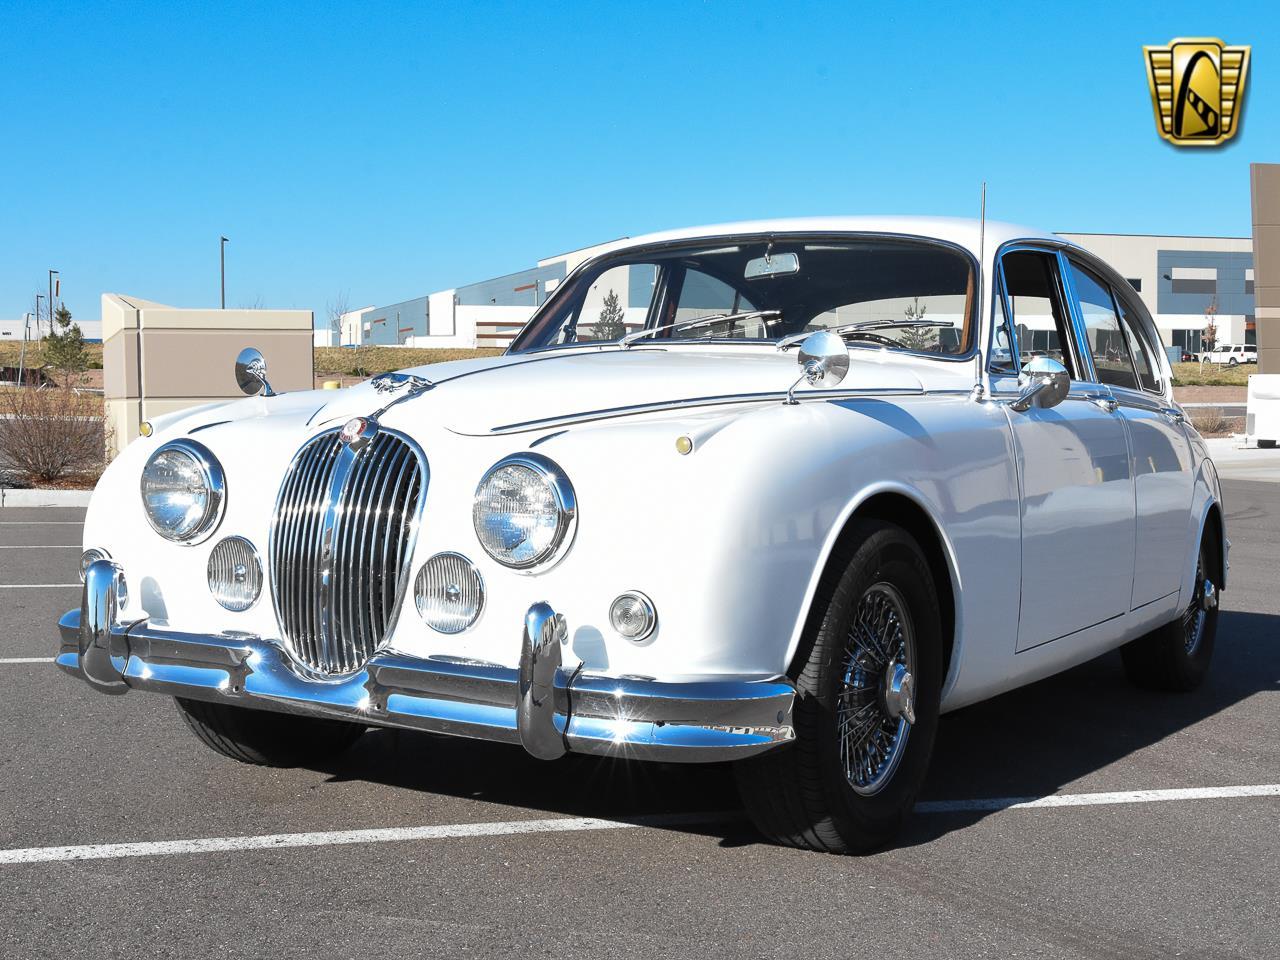 1963 Jaguar Mark II for Sale | ClassicCars.com | CC-1162833